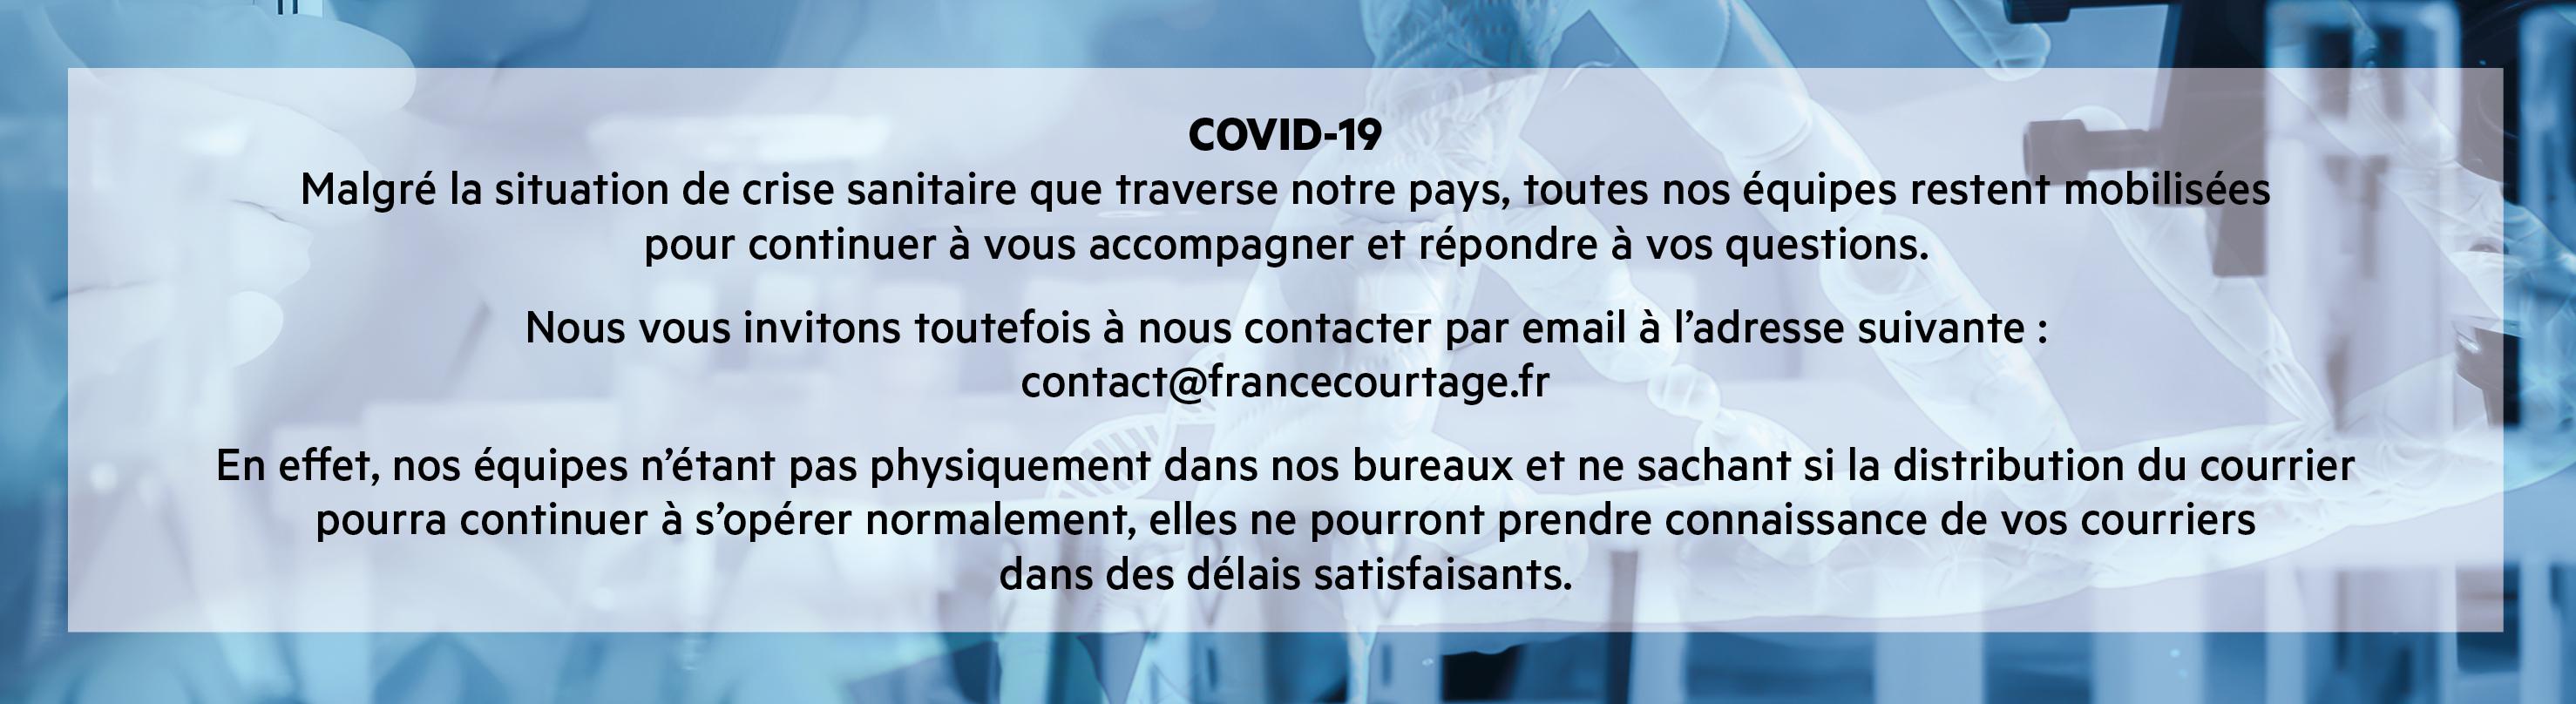 GFC-COVID19-groupe